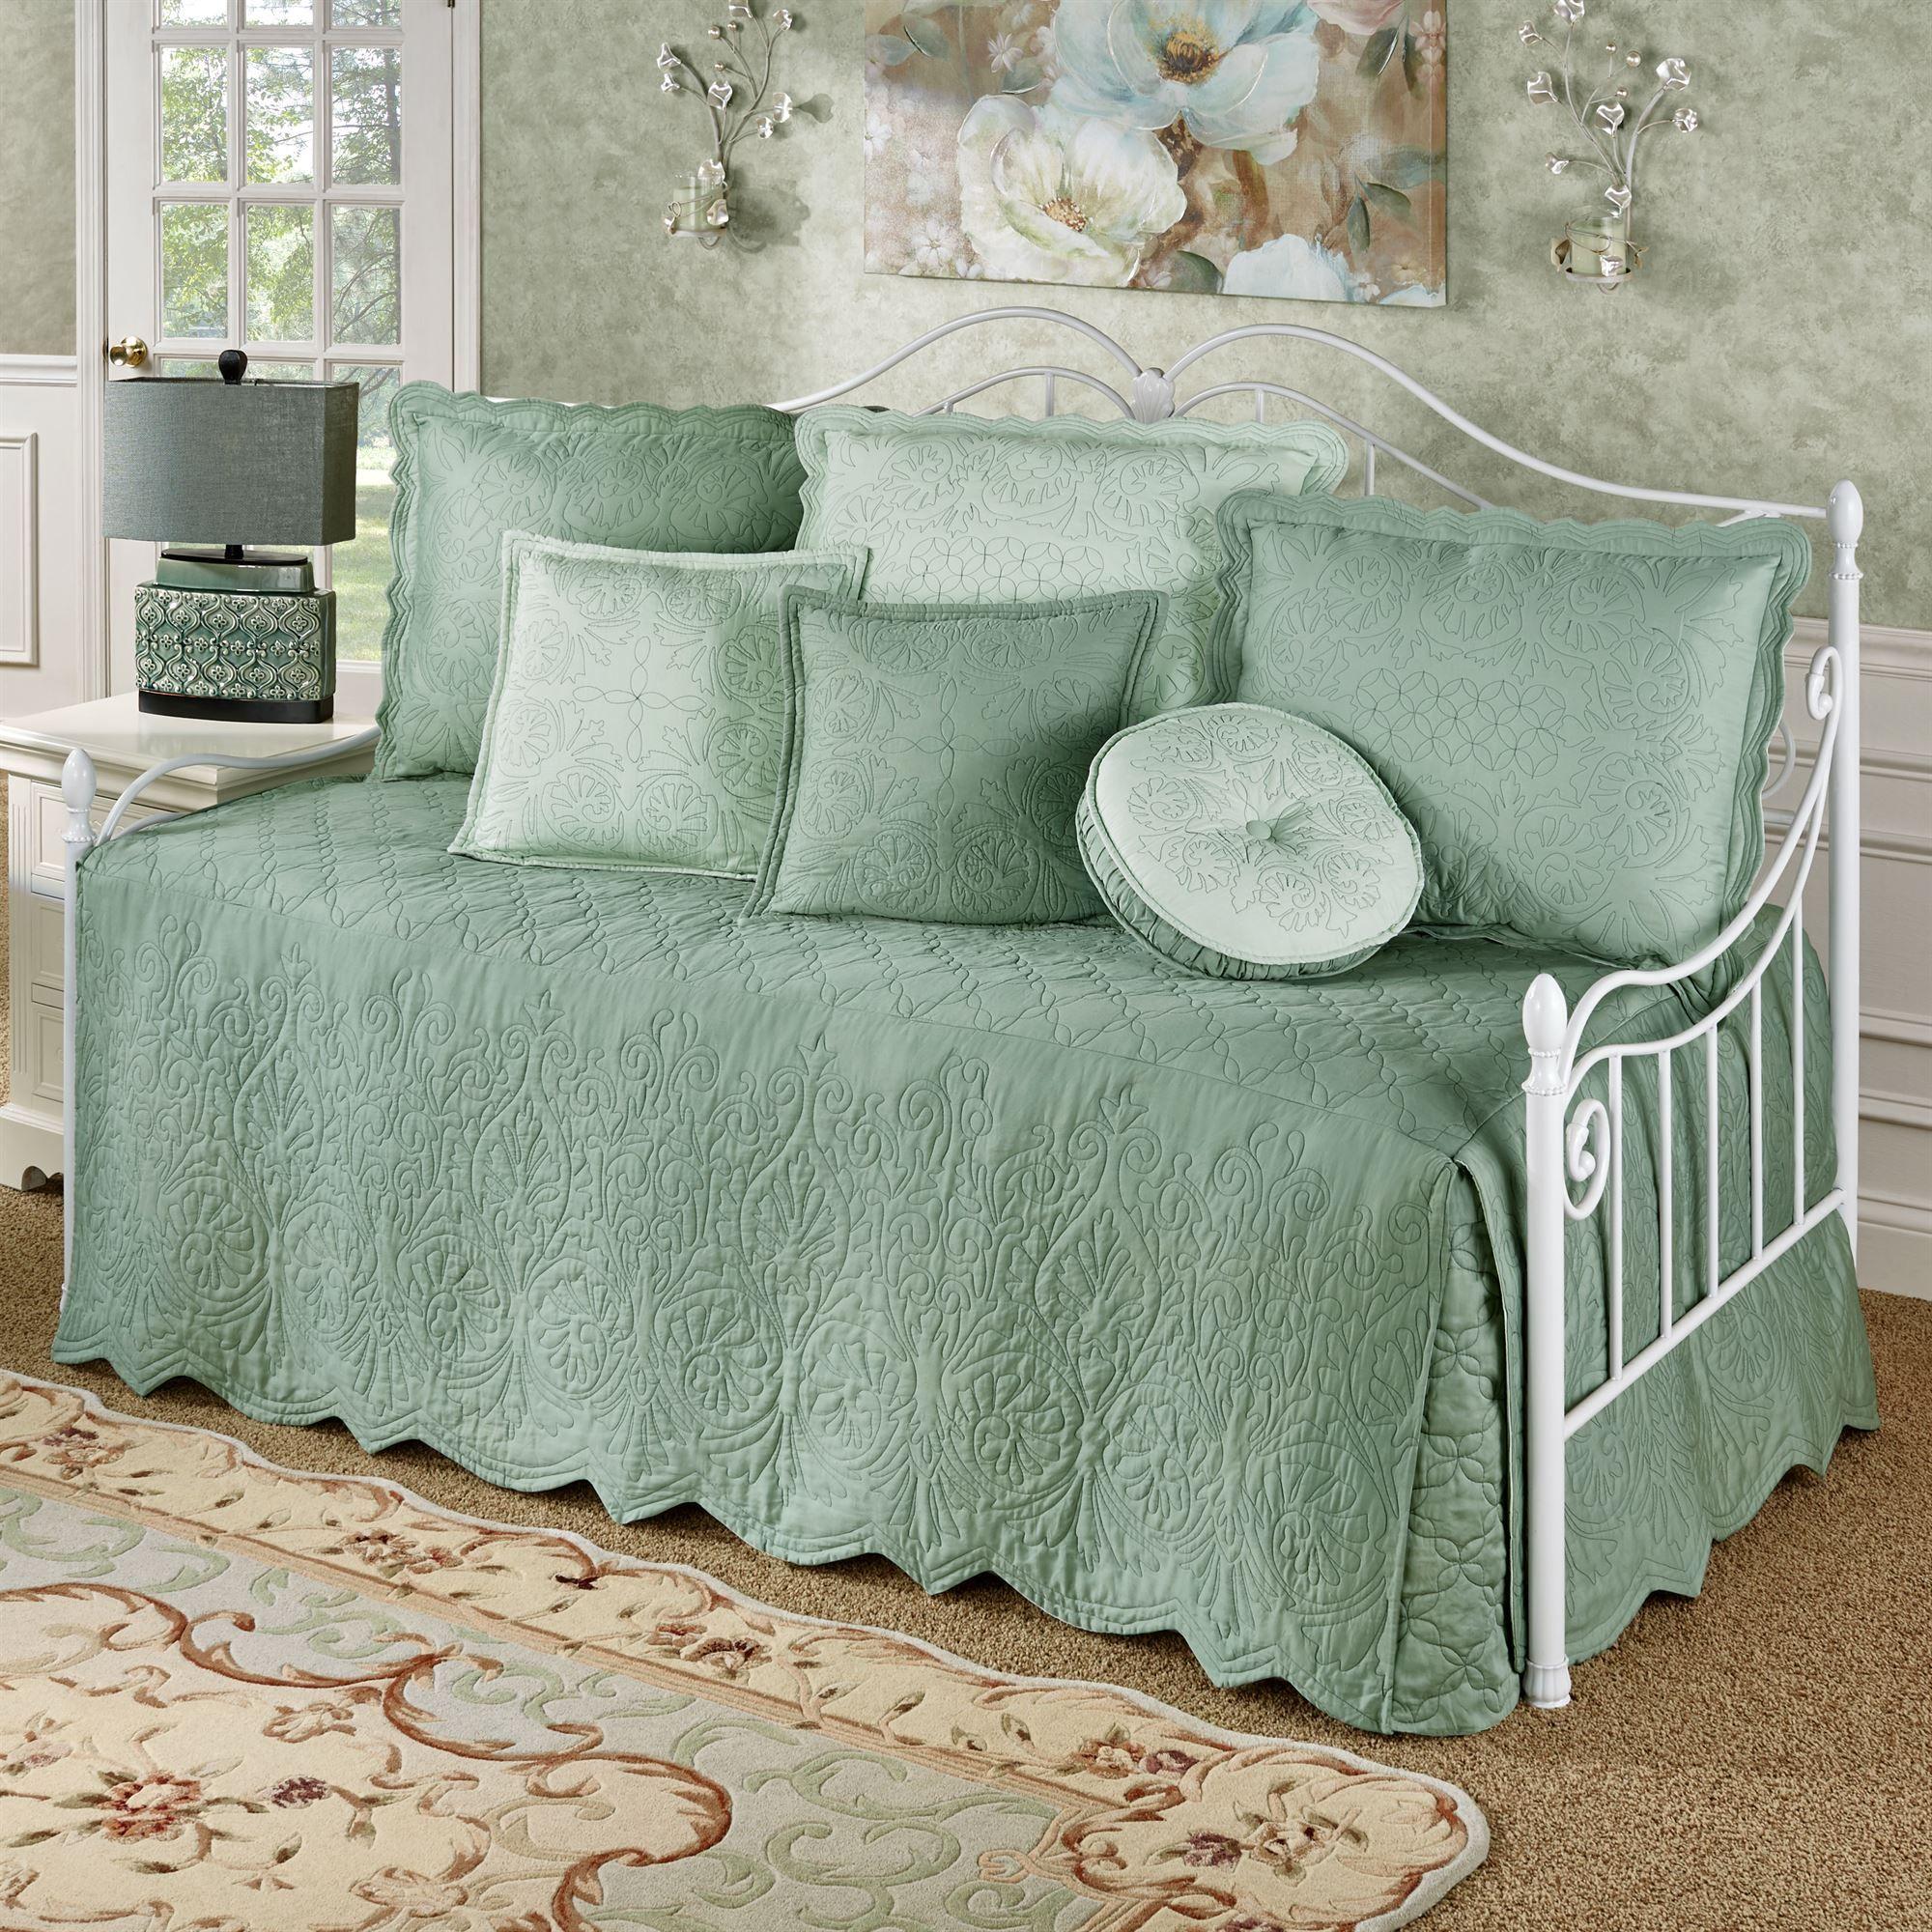 Everafter Celadon Quilted Daybed Bedding Set